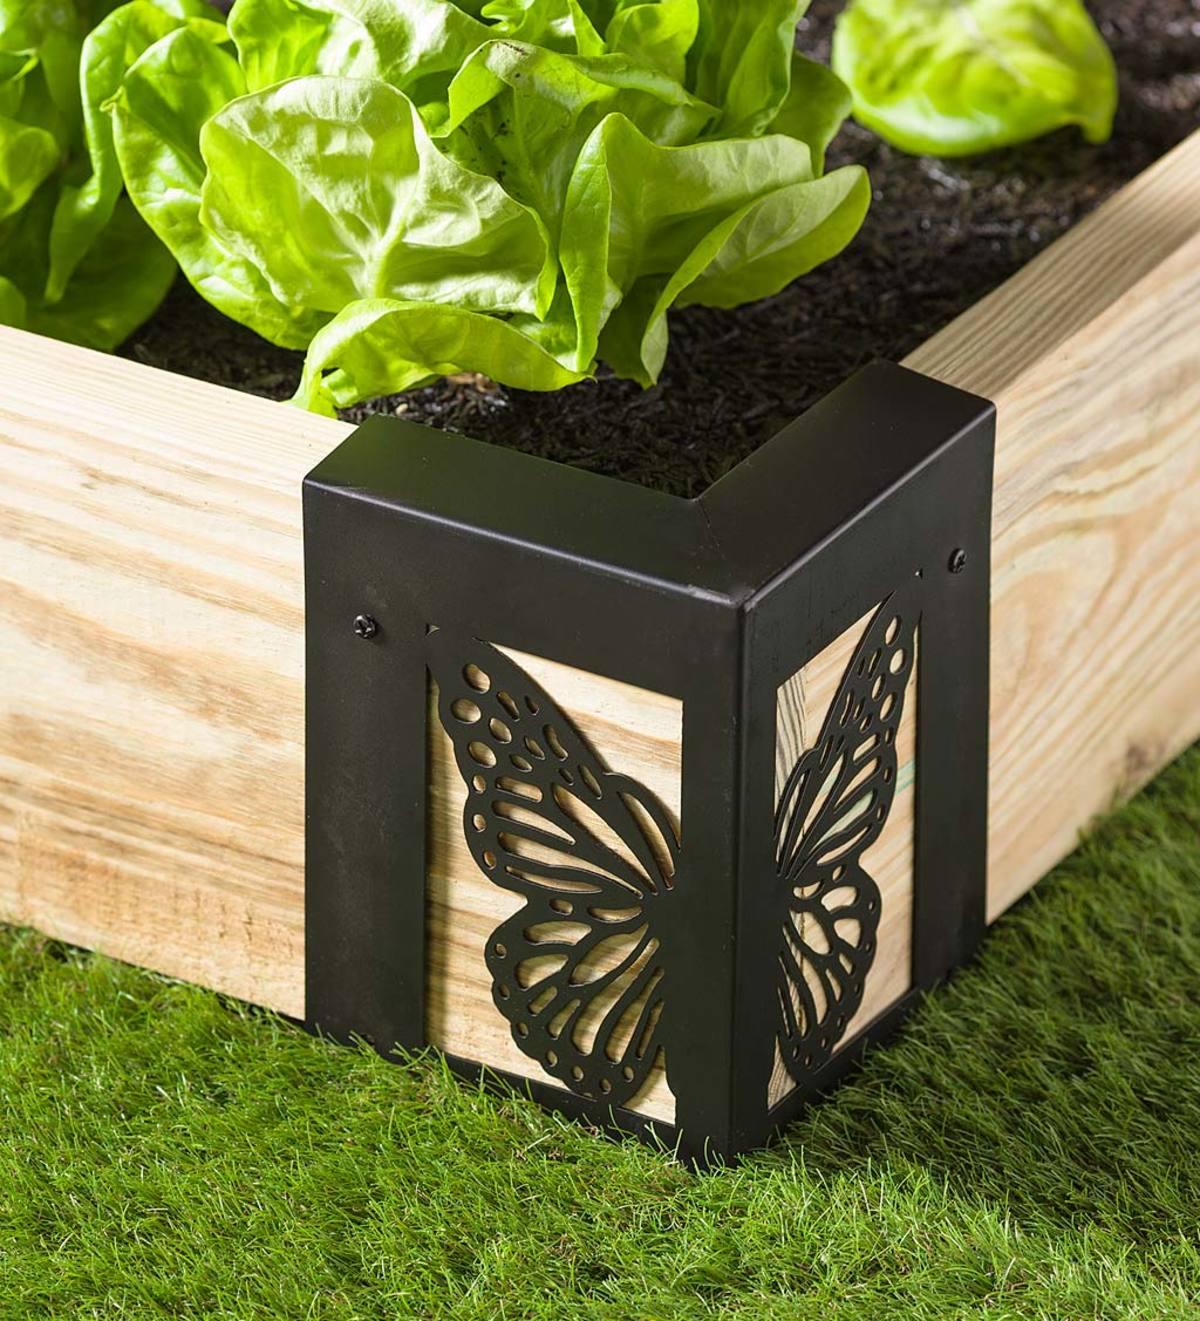 Image of: Steel Raised Garden Bed Corner Brackets In Butterfly Design Set Of 4 Plowhearth